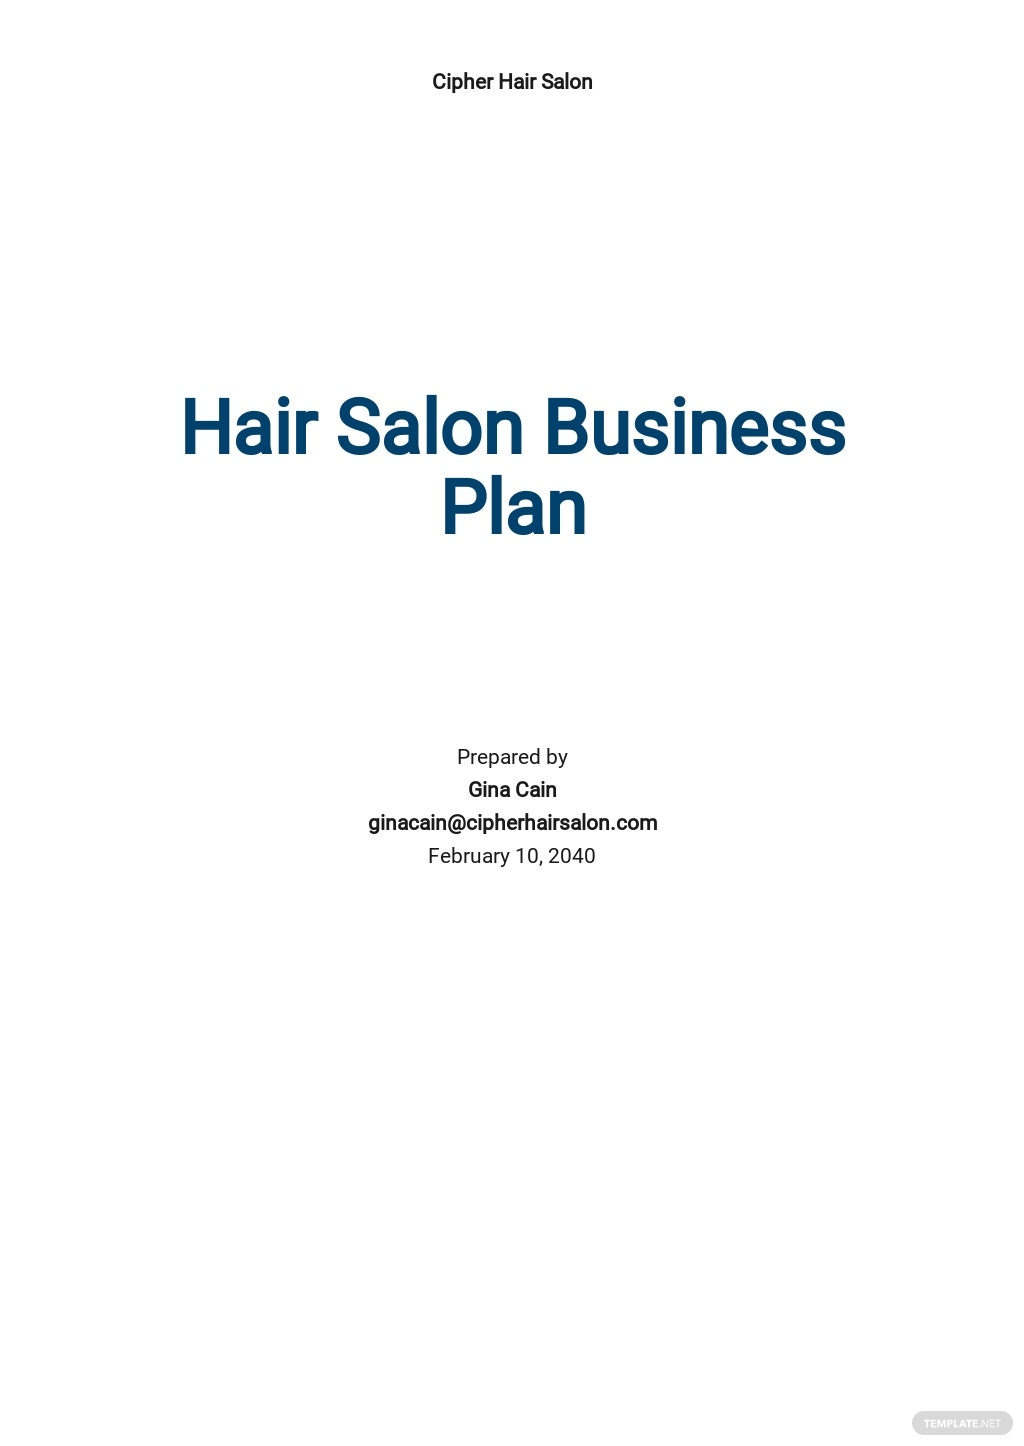 Hair Salon Business Plan Template.jpe